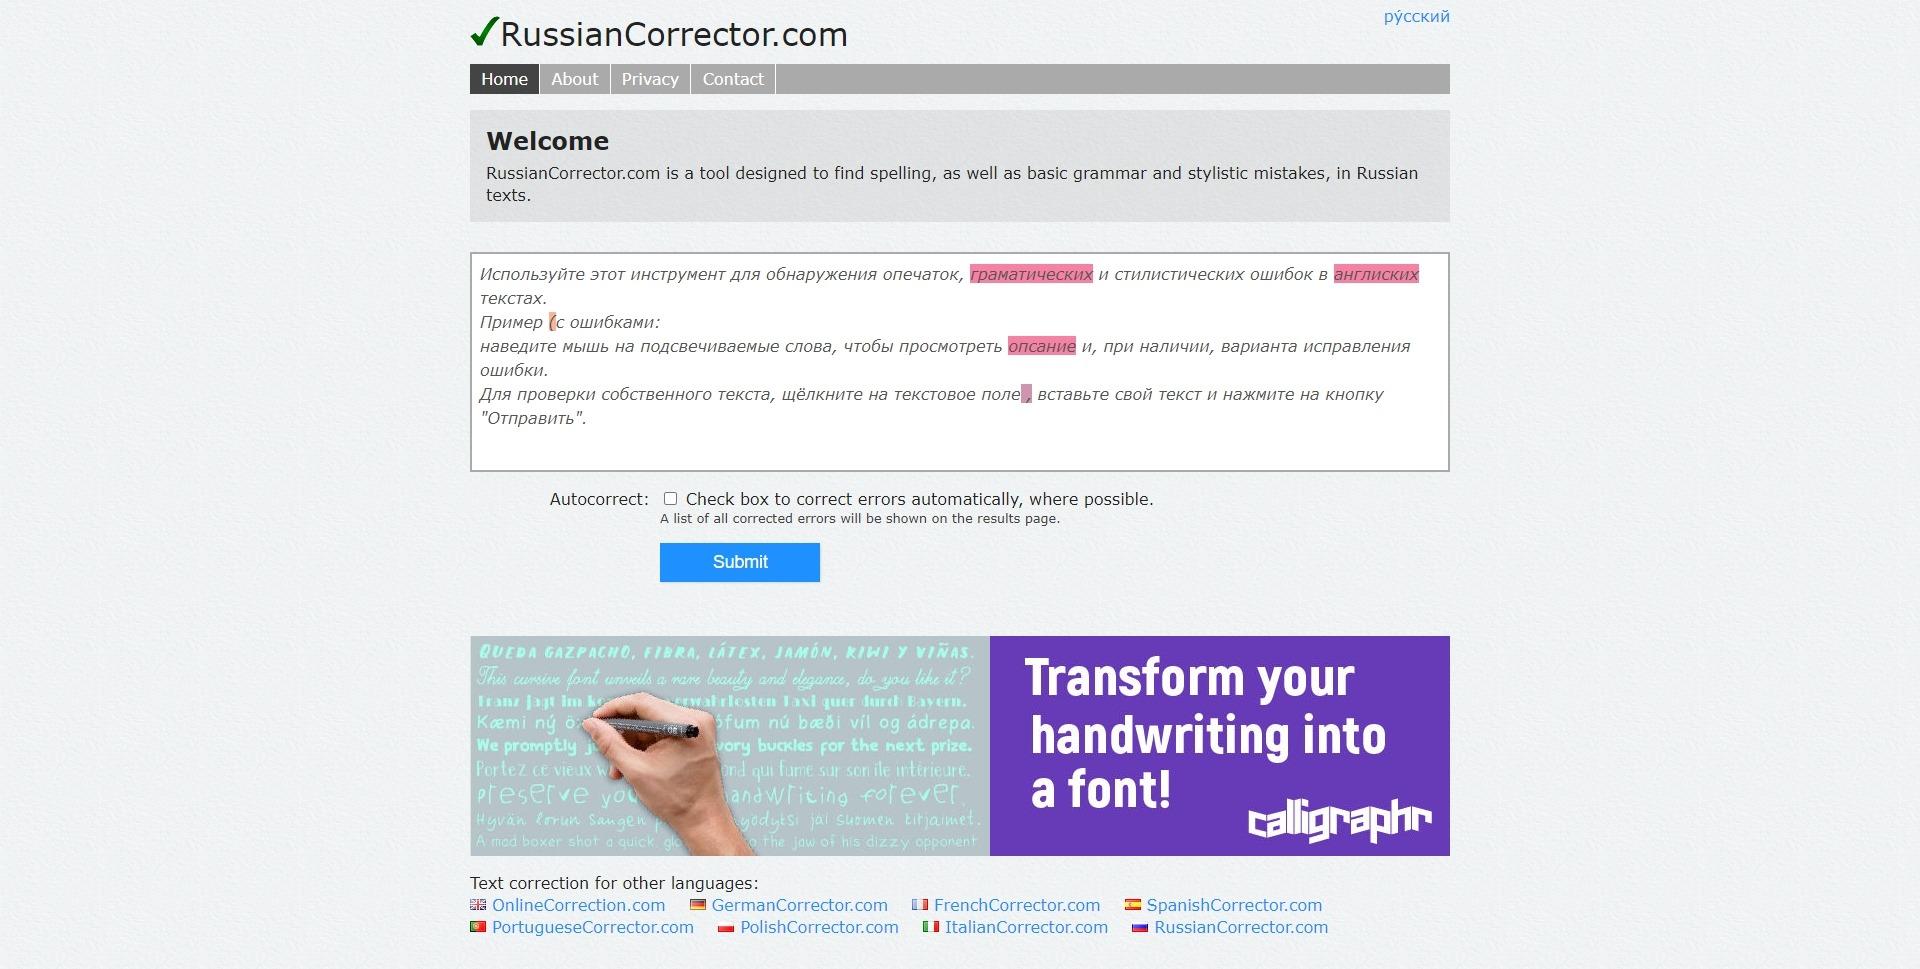 Проверка пунктуации онлайн: RussianCorrector.com